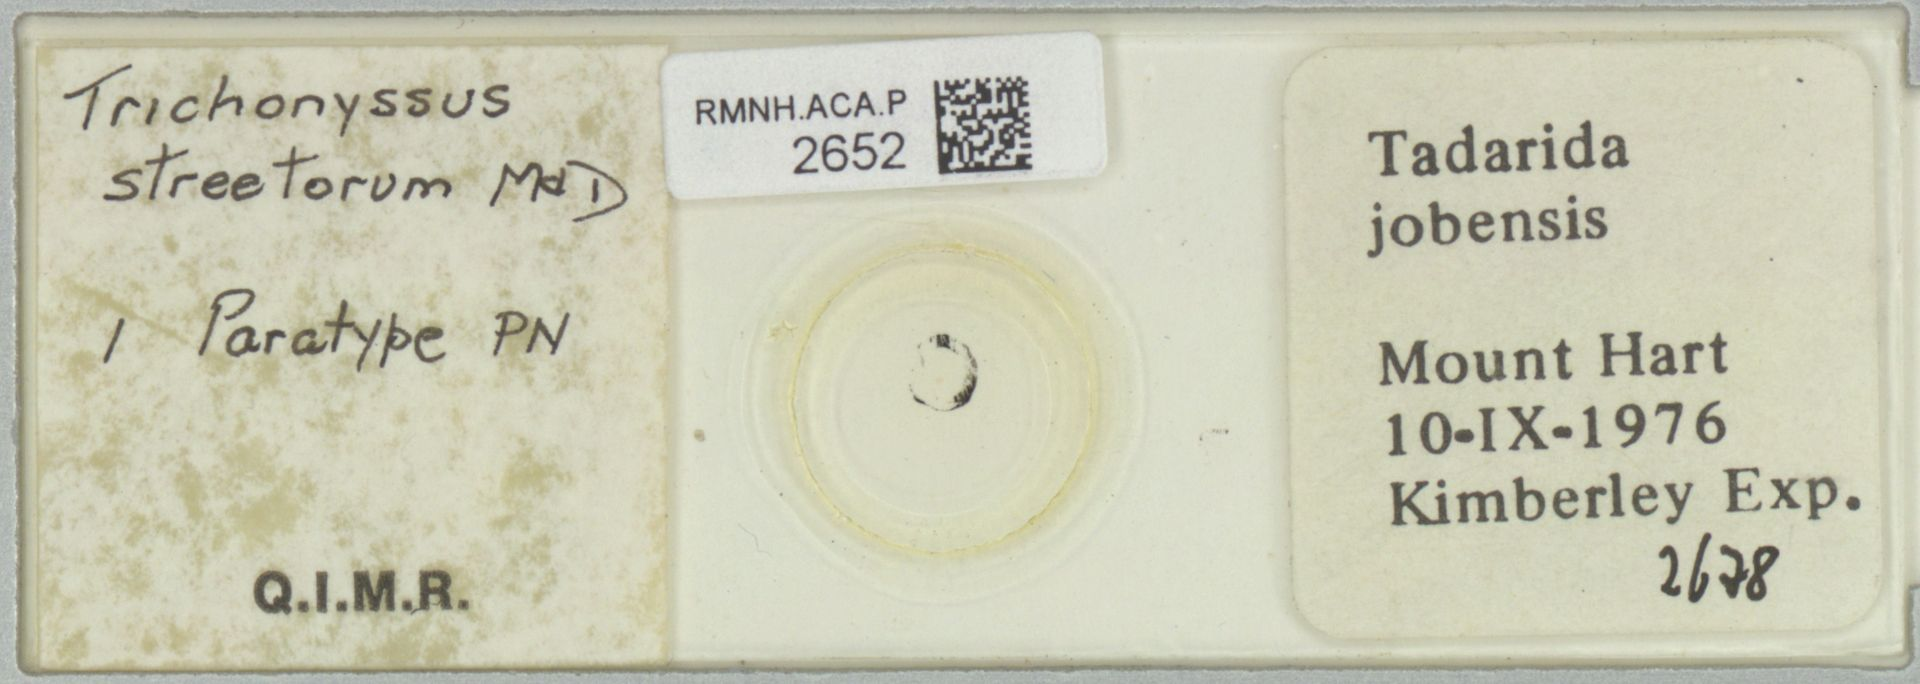 RMNH.ACA.P.2652 | Trichonyssus streetorum Micherdzinski & Domrow, 1985